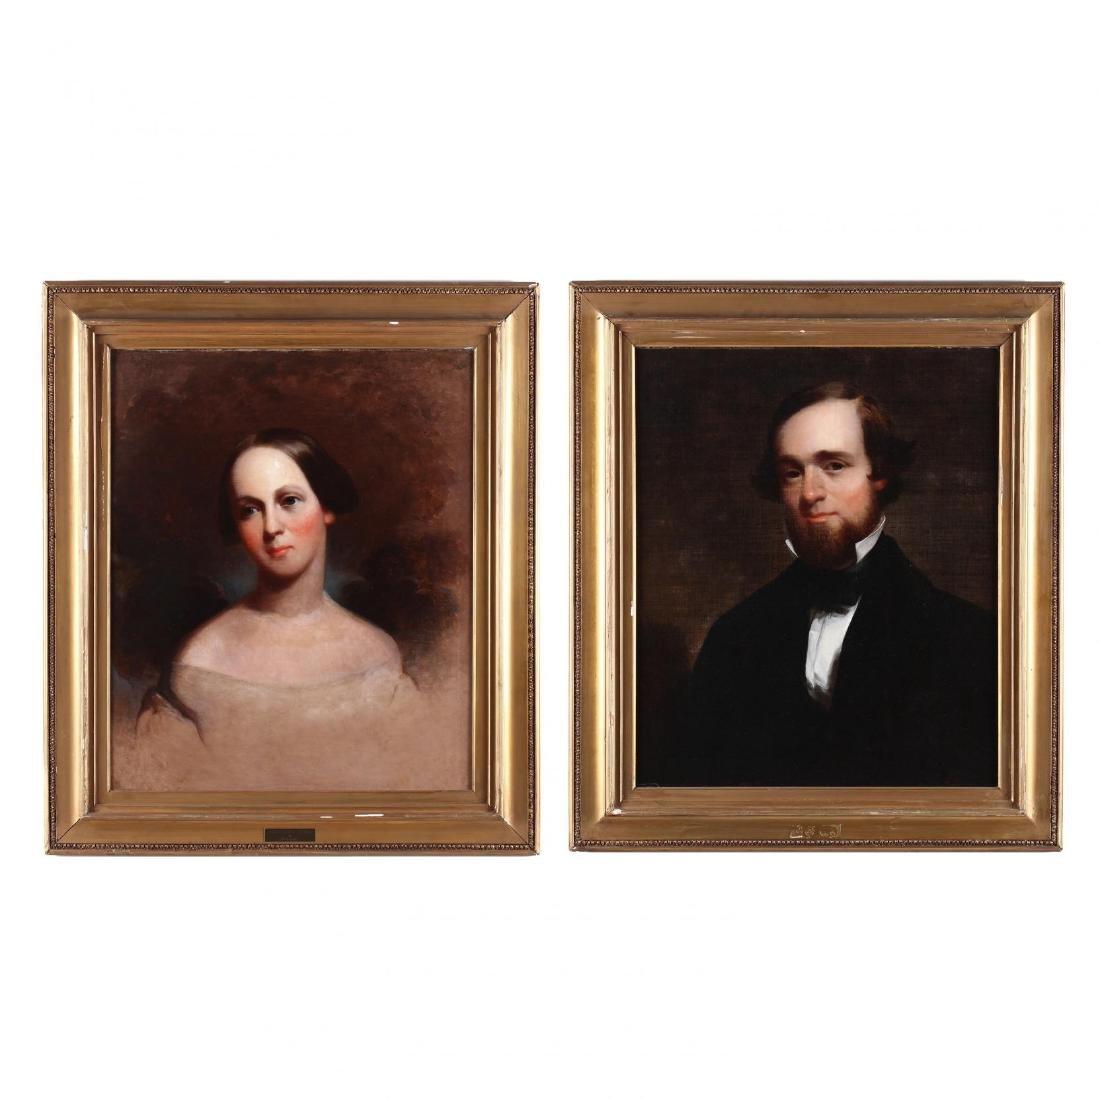 att. John Neagle (PA, 1796-1865), Portraits of Charles